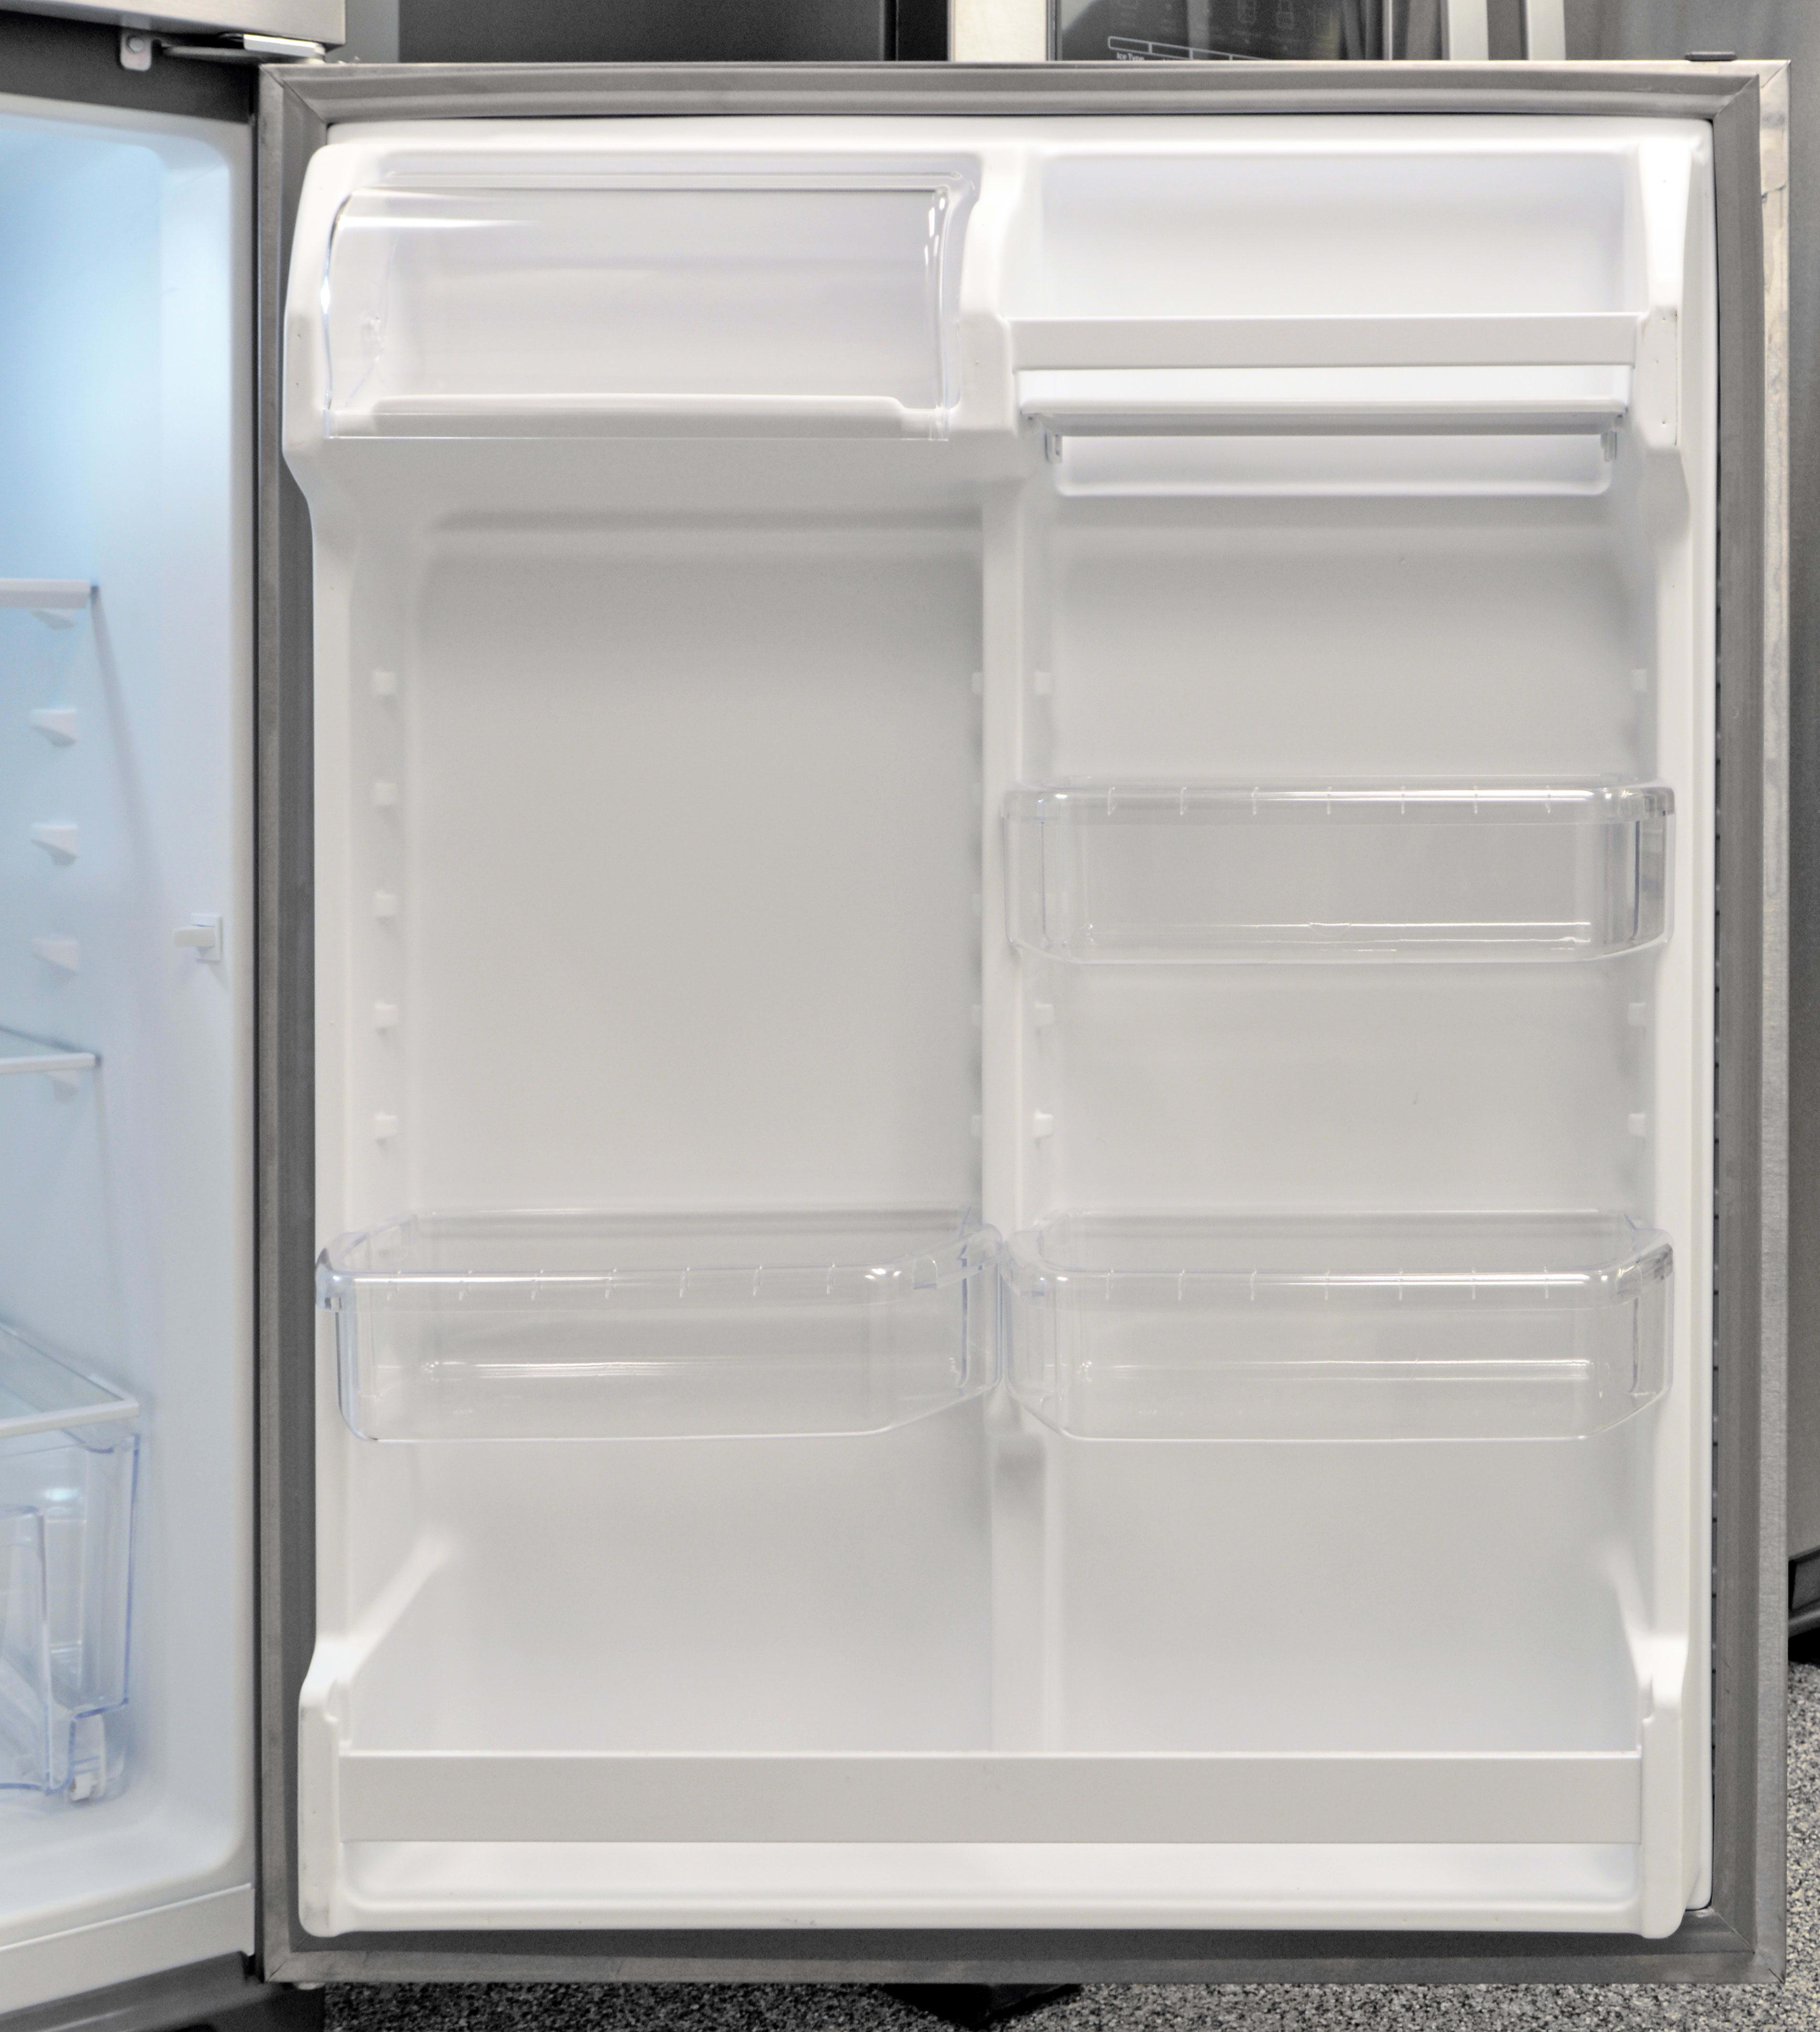 Whirlpool WRT311FZDM Refrigerator Review Reviewed Refrigerators